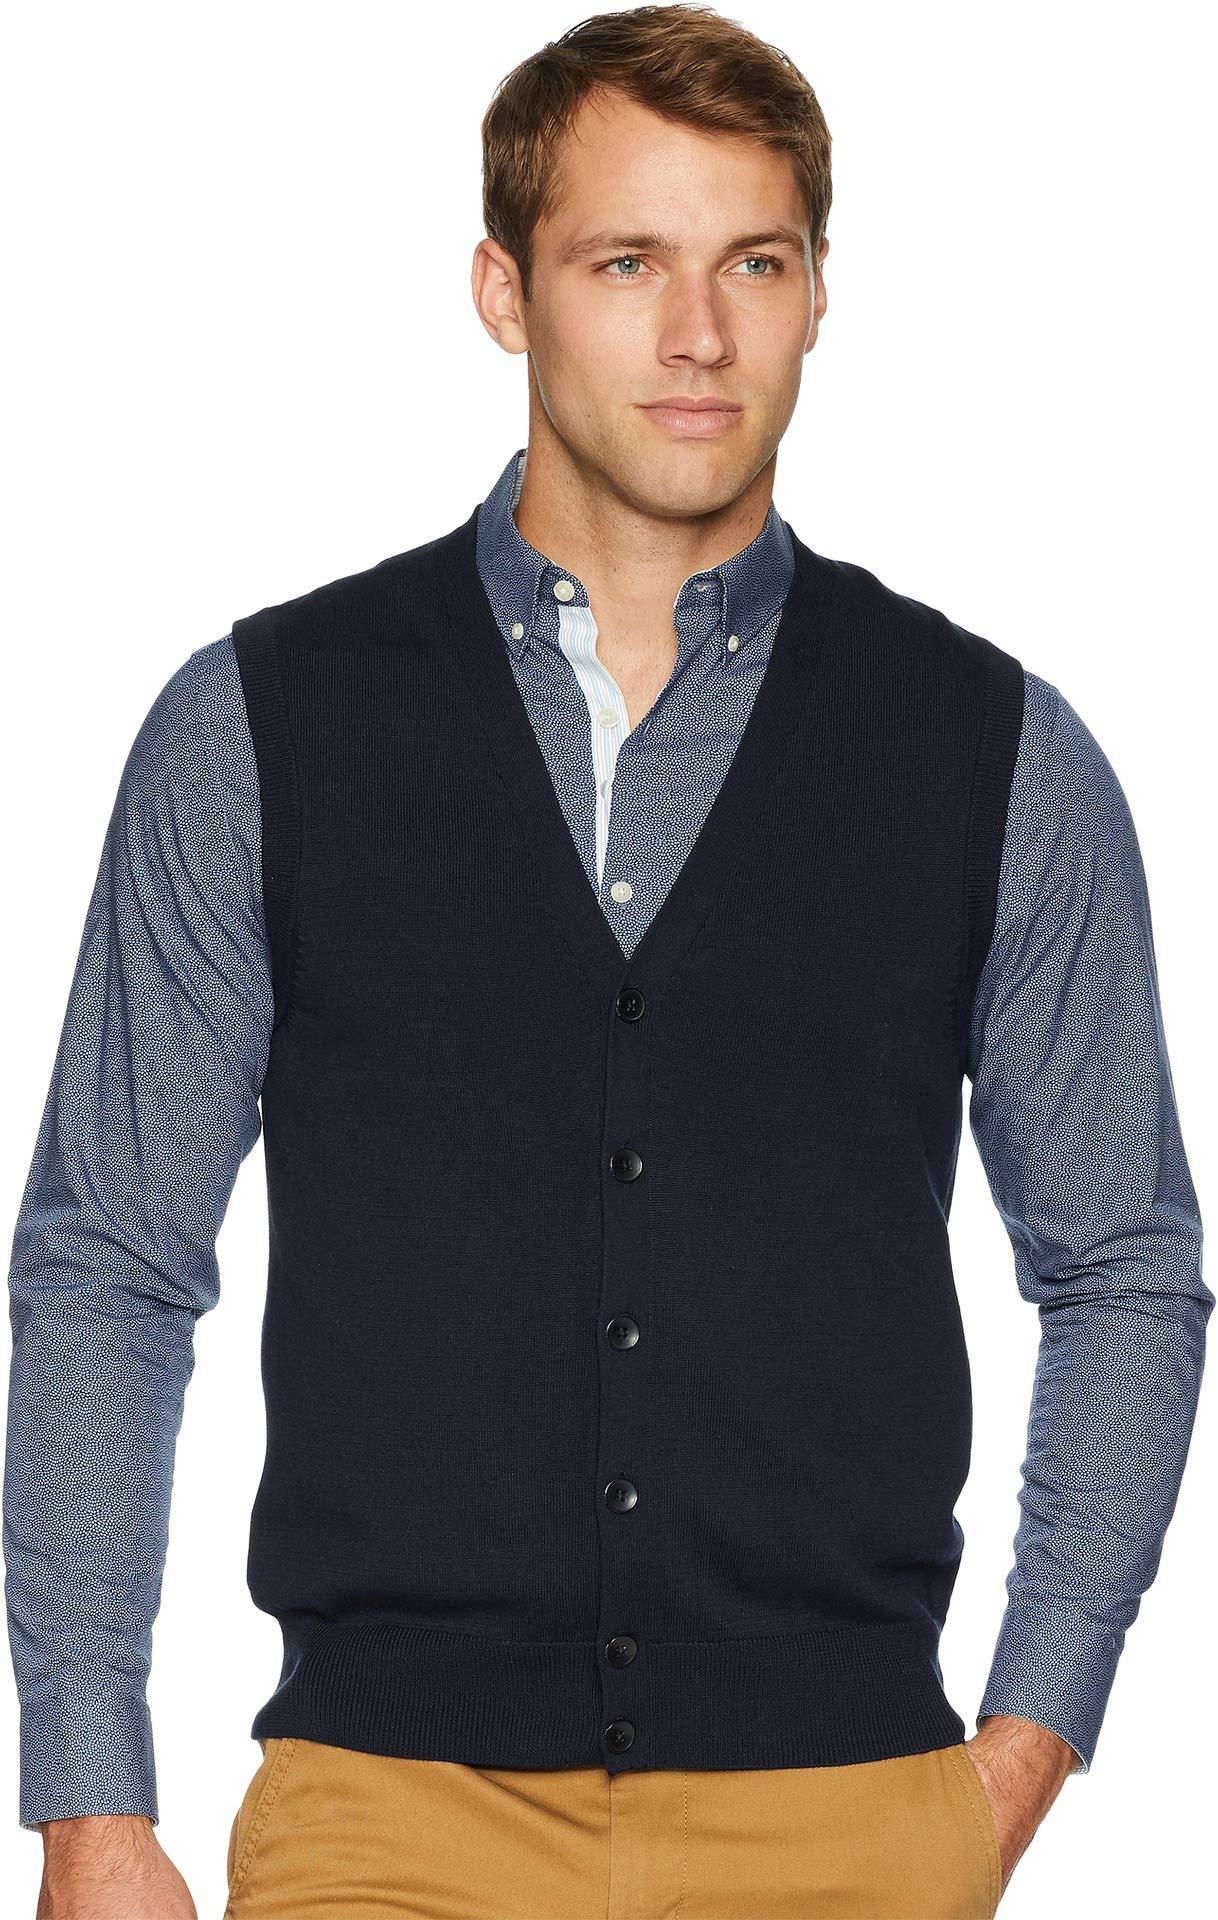 Perry Ellis Men's Jersey Knit Vest, Dark Sapphire/DFG, Medium by Perry Ellis